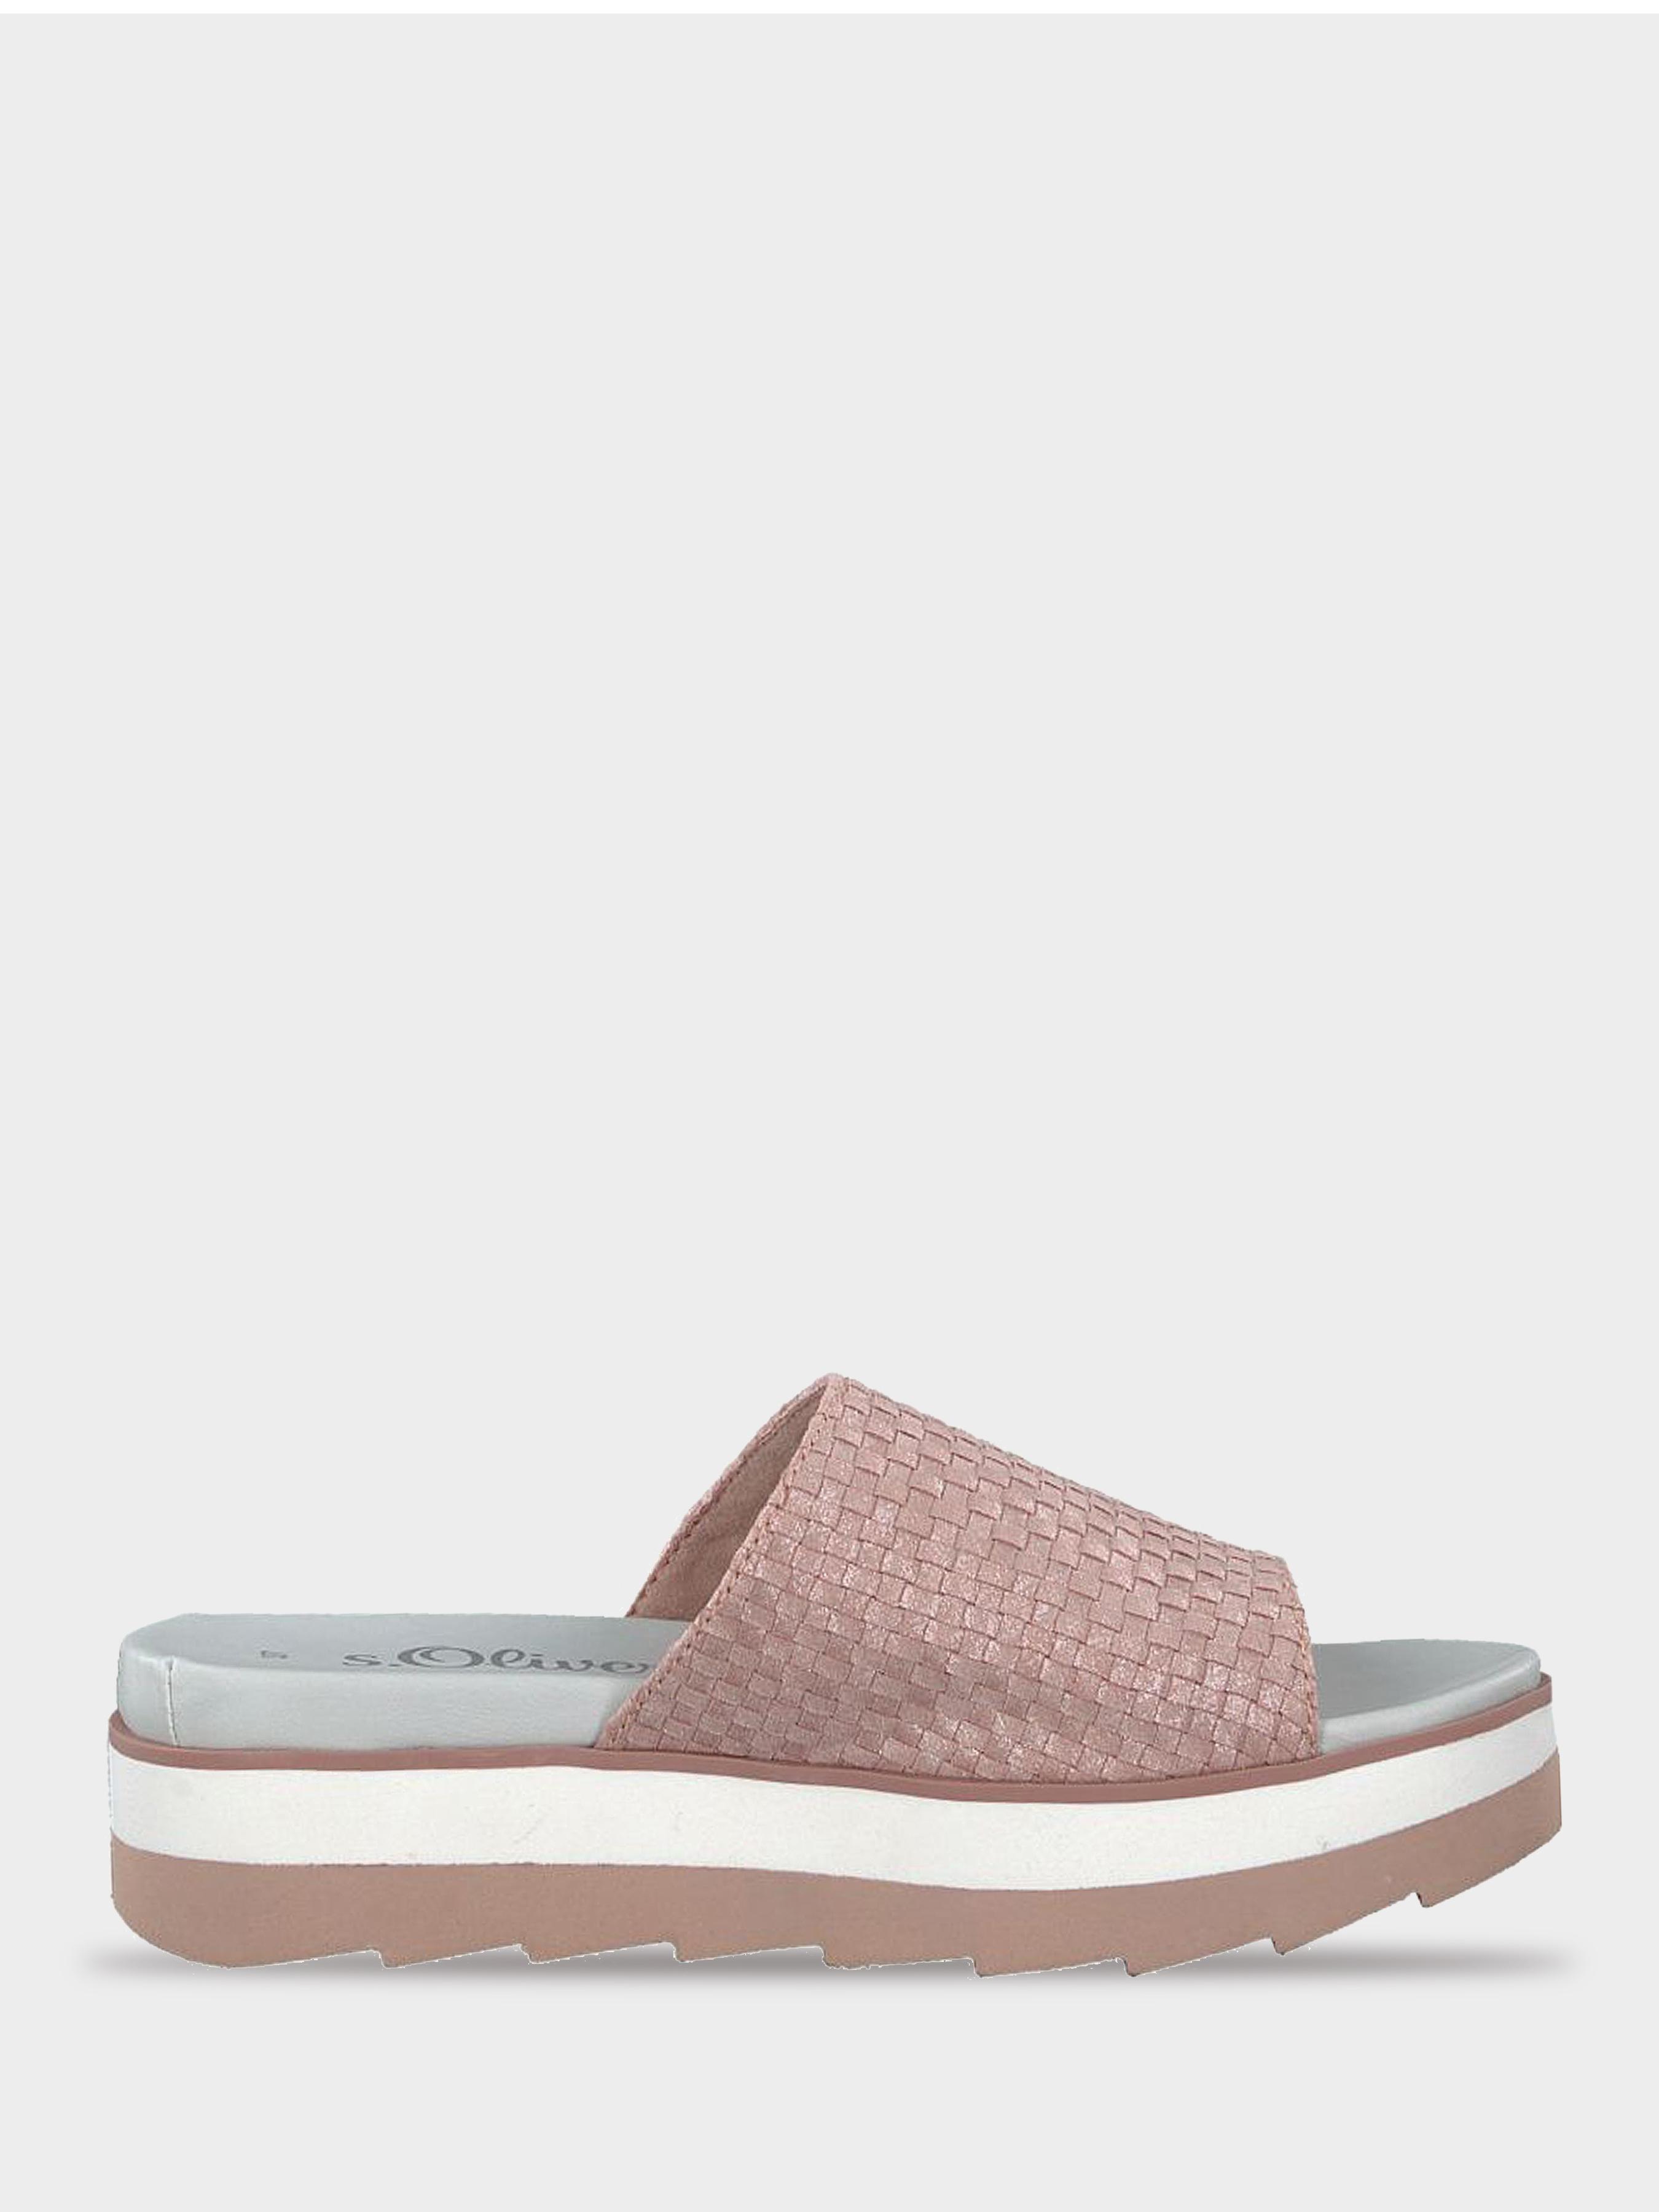 Шлёпанцы для женщин S.Oliver 8W11 размерная сетка обуви, 2017